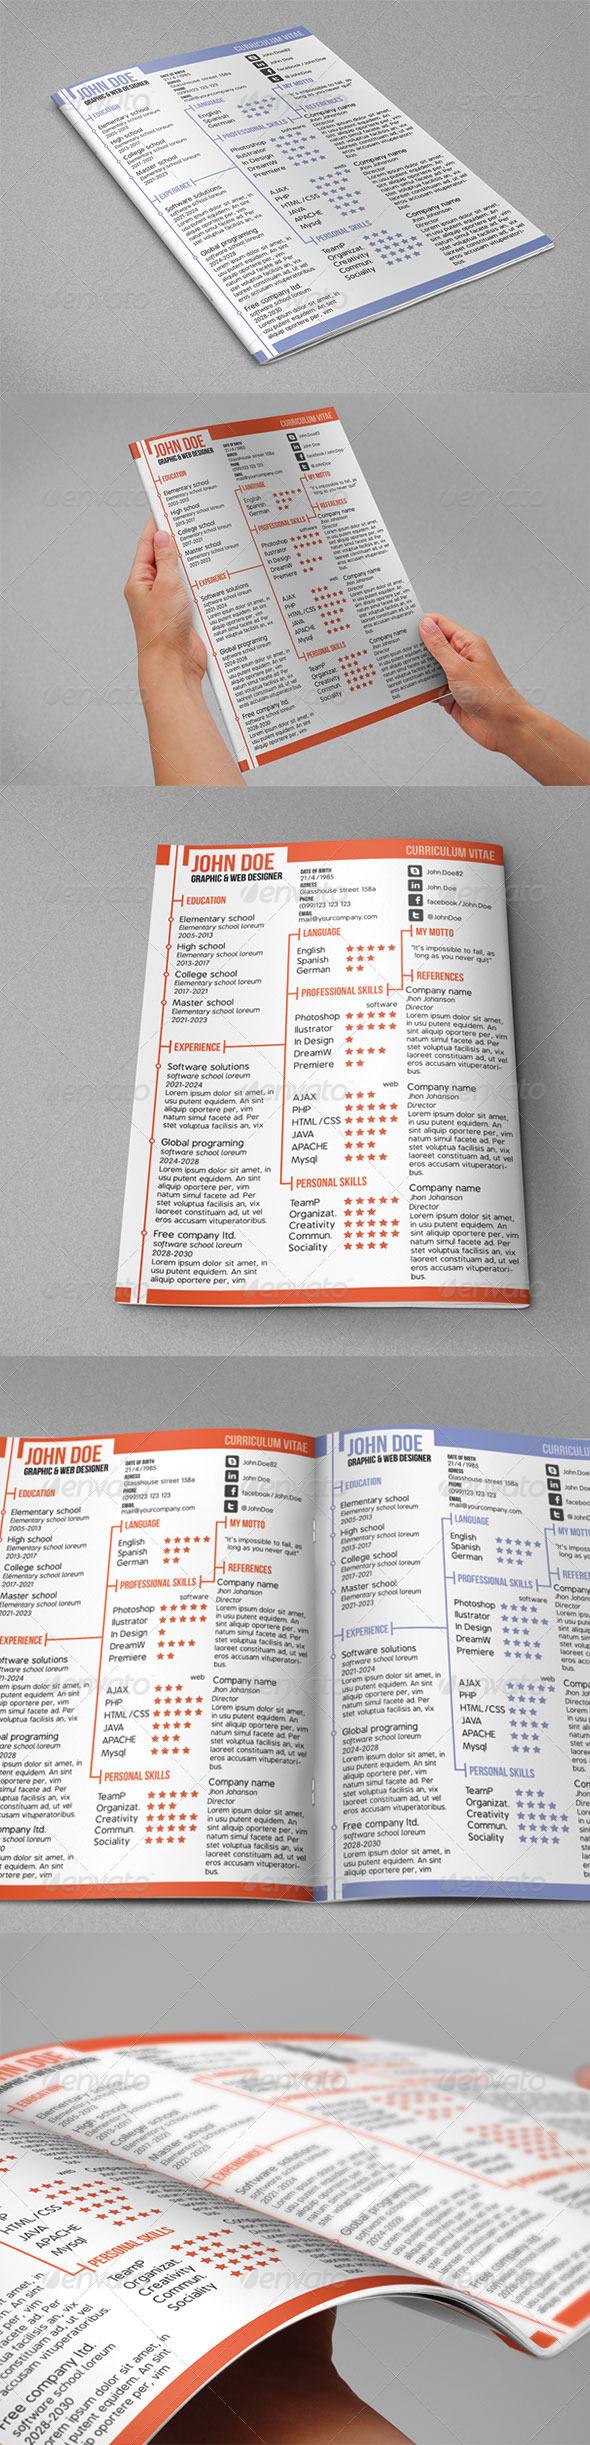 GraphicRiver Personal CV 5408755